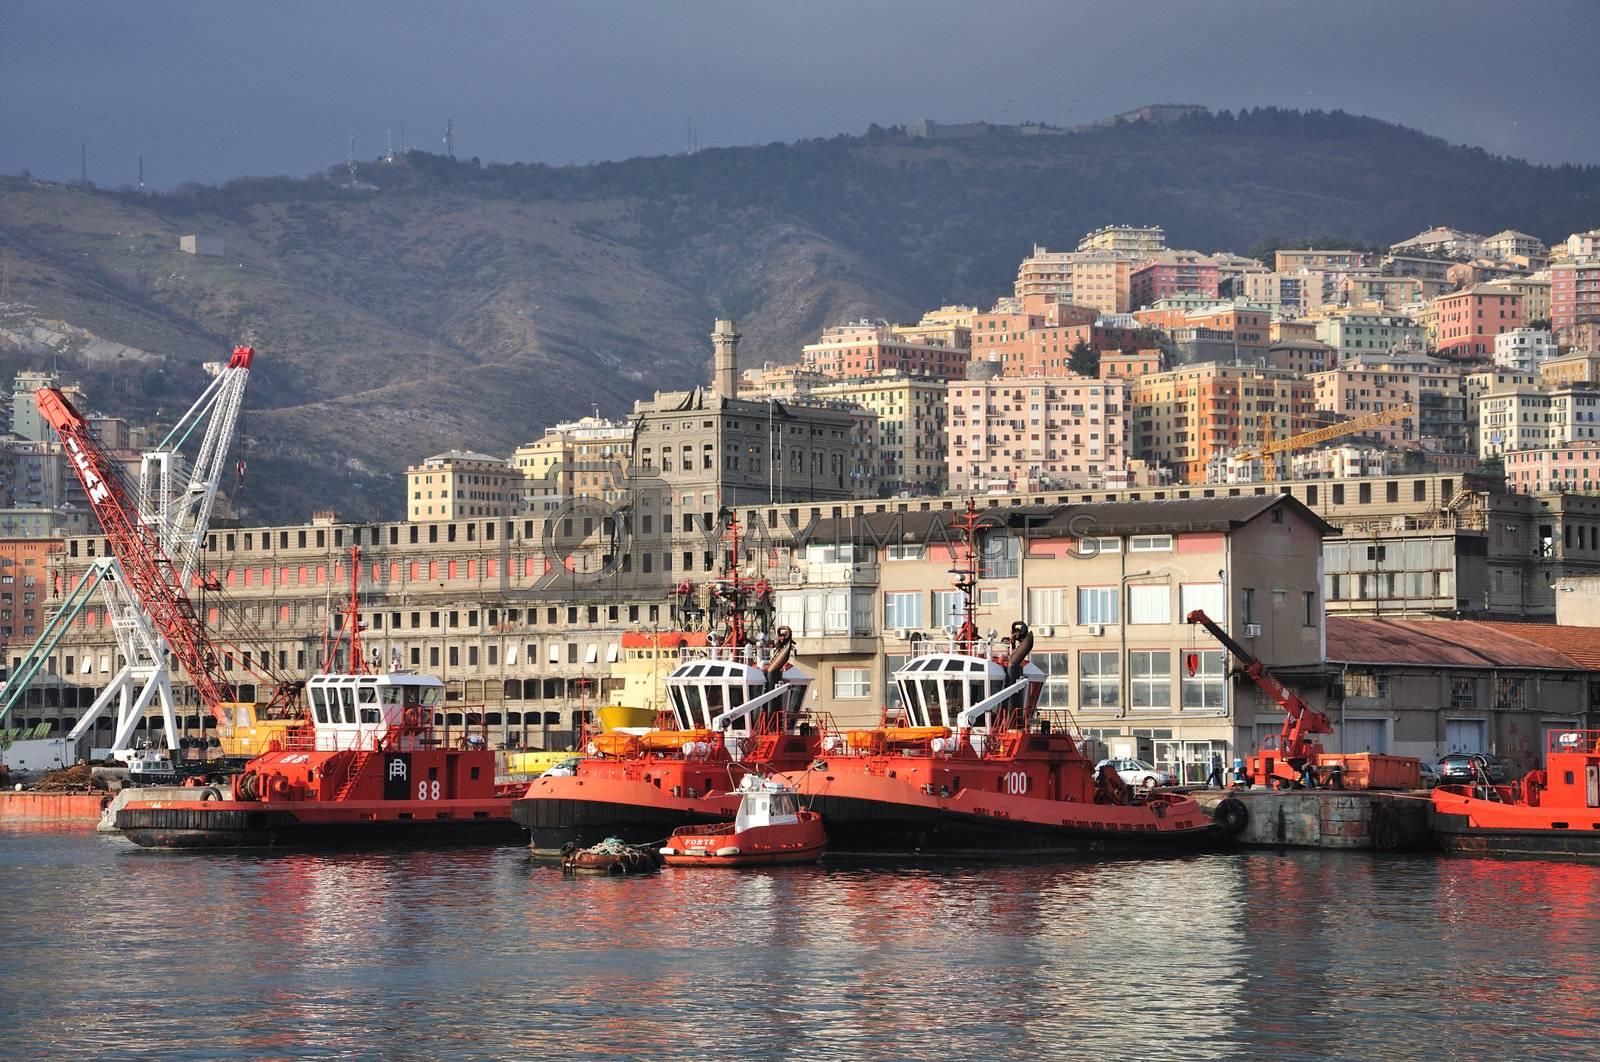 Cranes, boats, stock in Genoa.